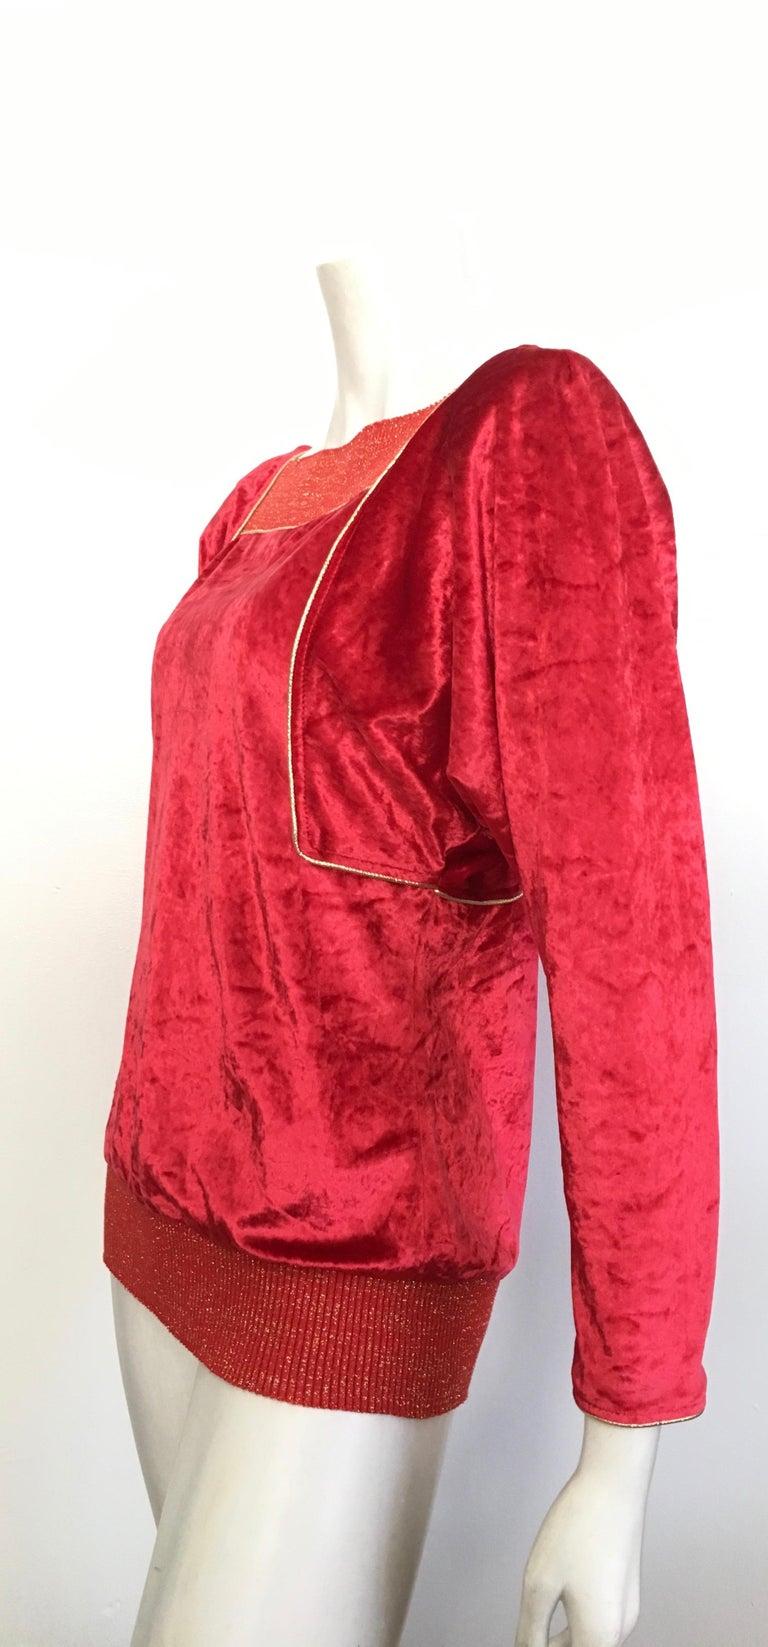 Oscar de la Renta for Swirl 1980s Red Velvet & Metallic Trim Blouse Size P. For Sale 8